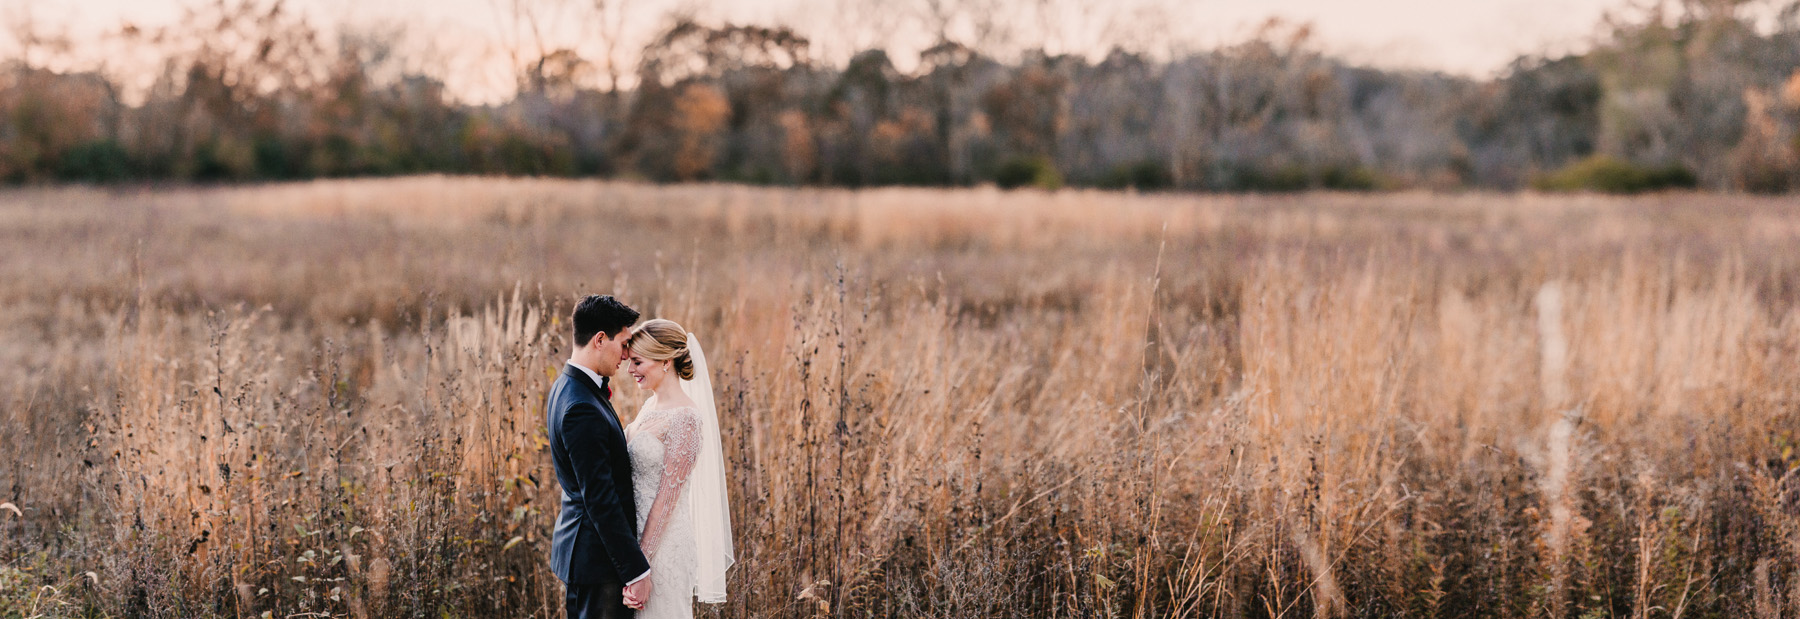 dan-michelle-wedding_TSP-180544.jpg